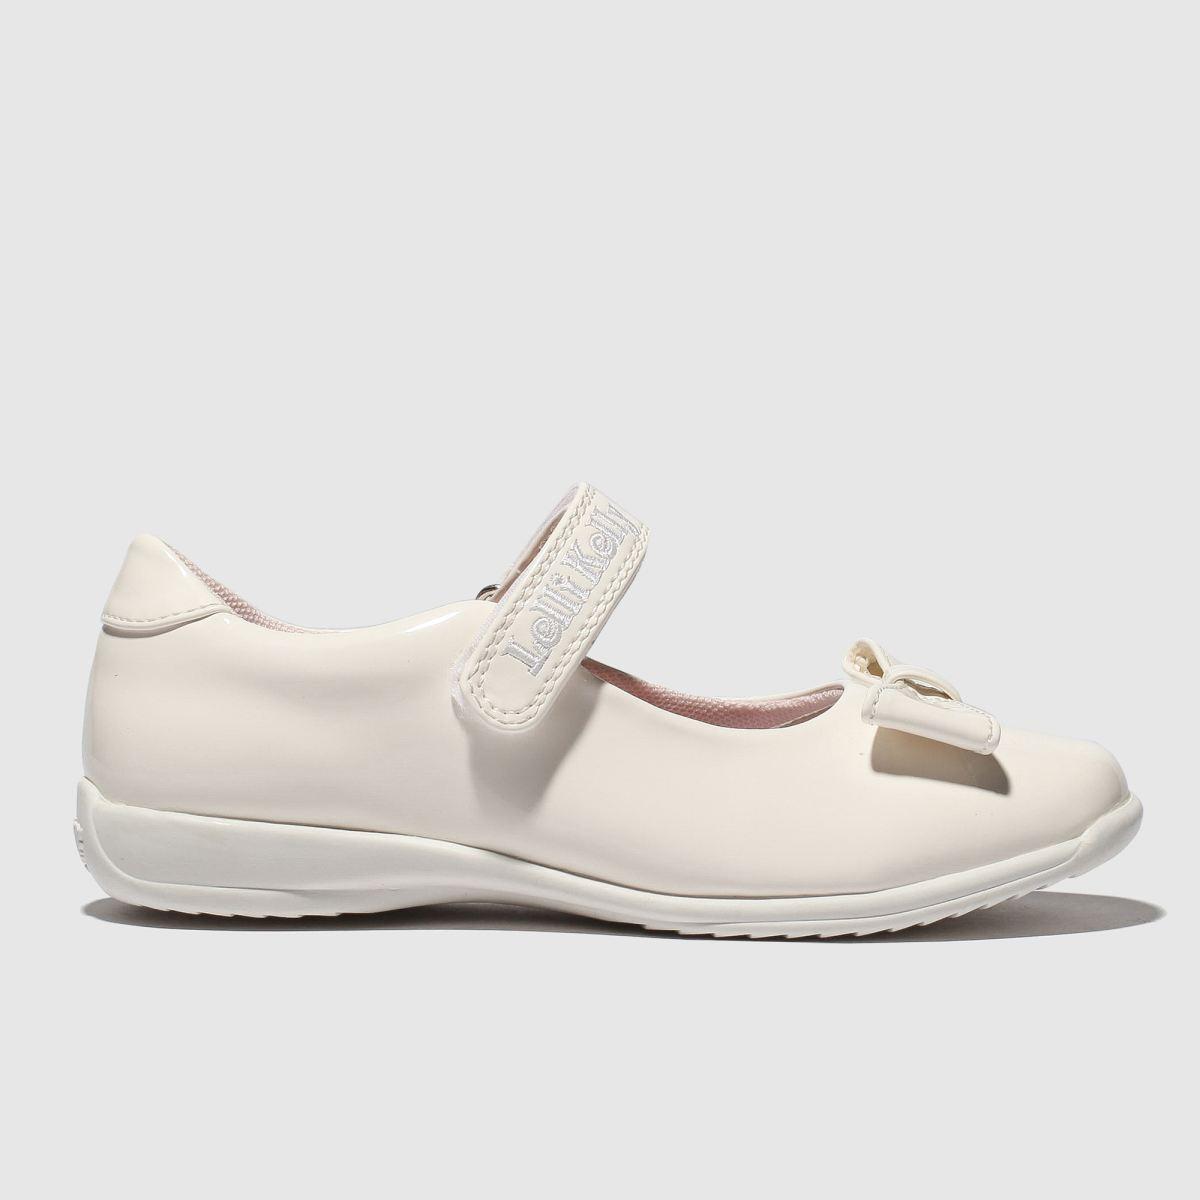 Lelli Kelly White Sarah Dolly Shoes Junior